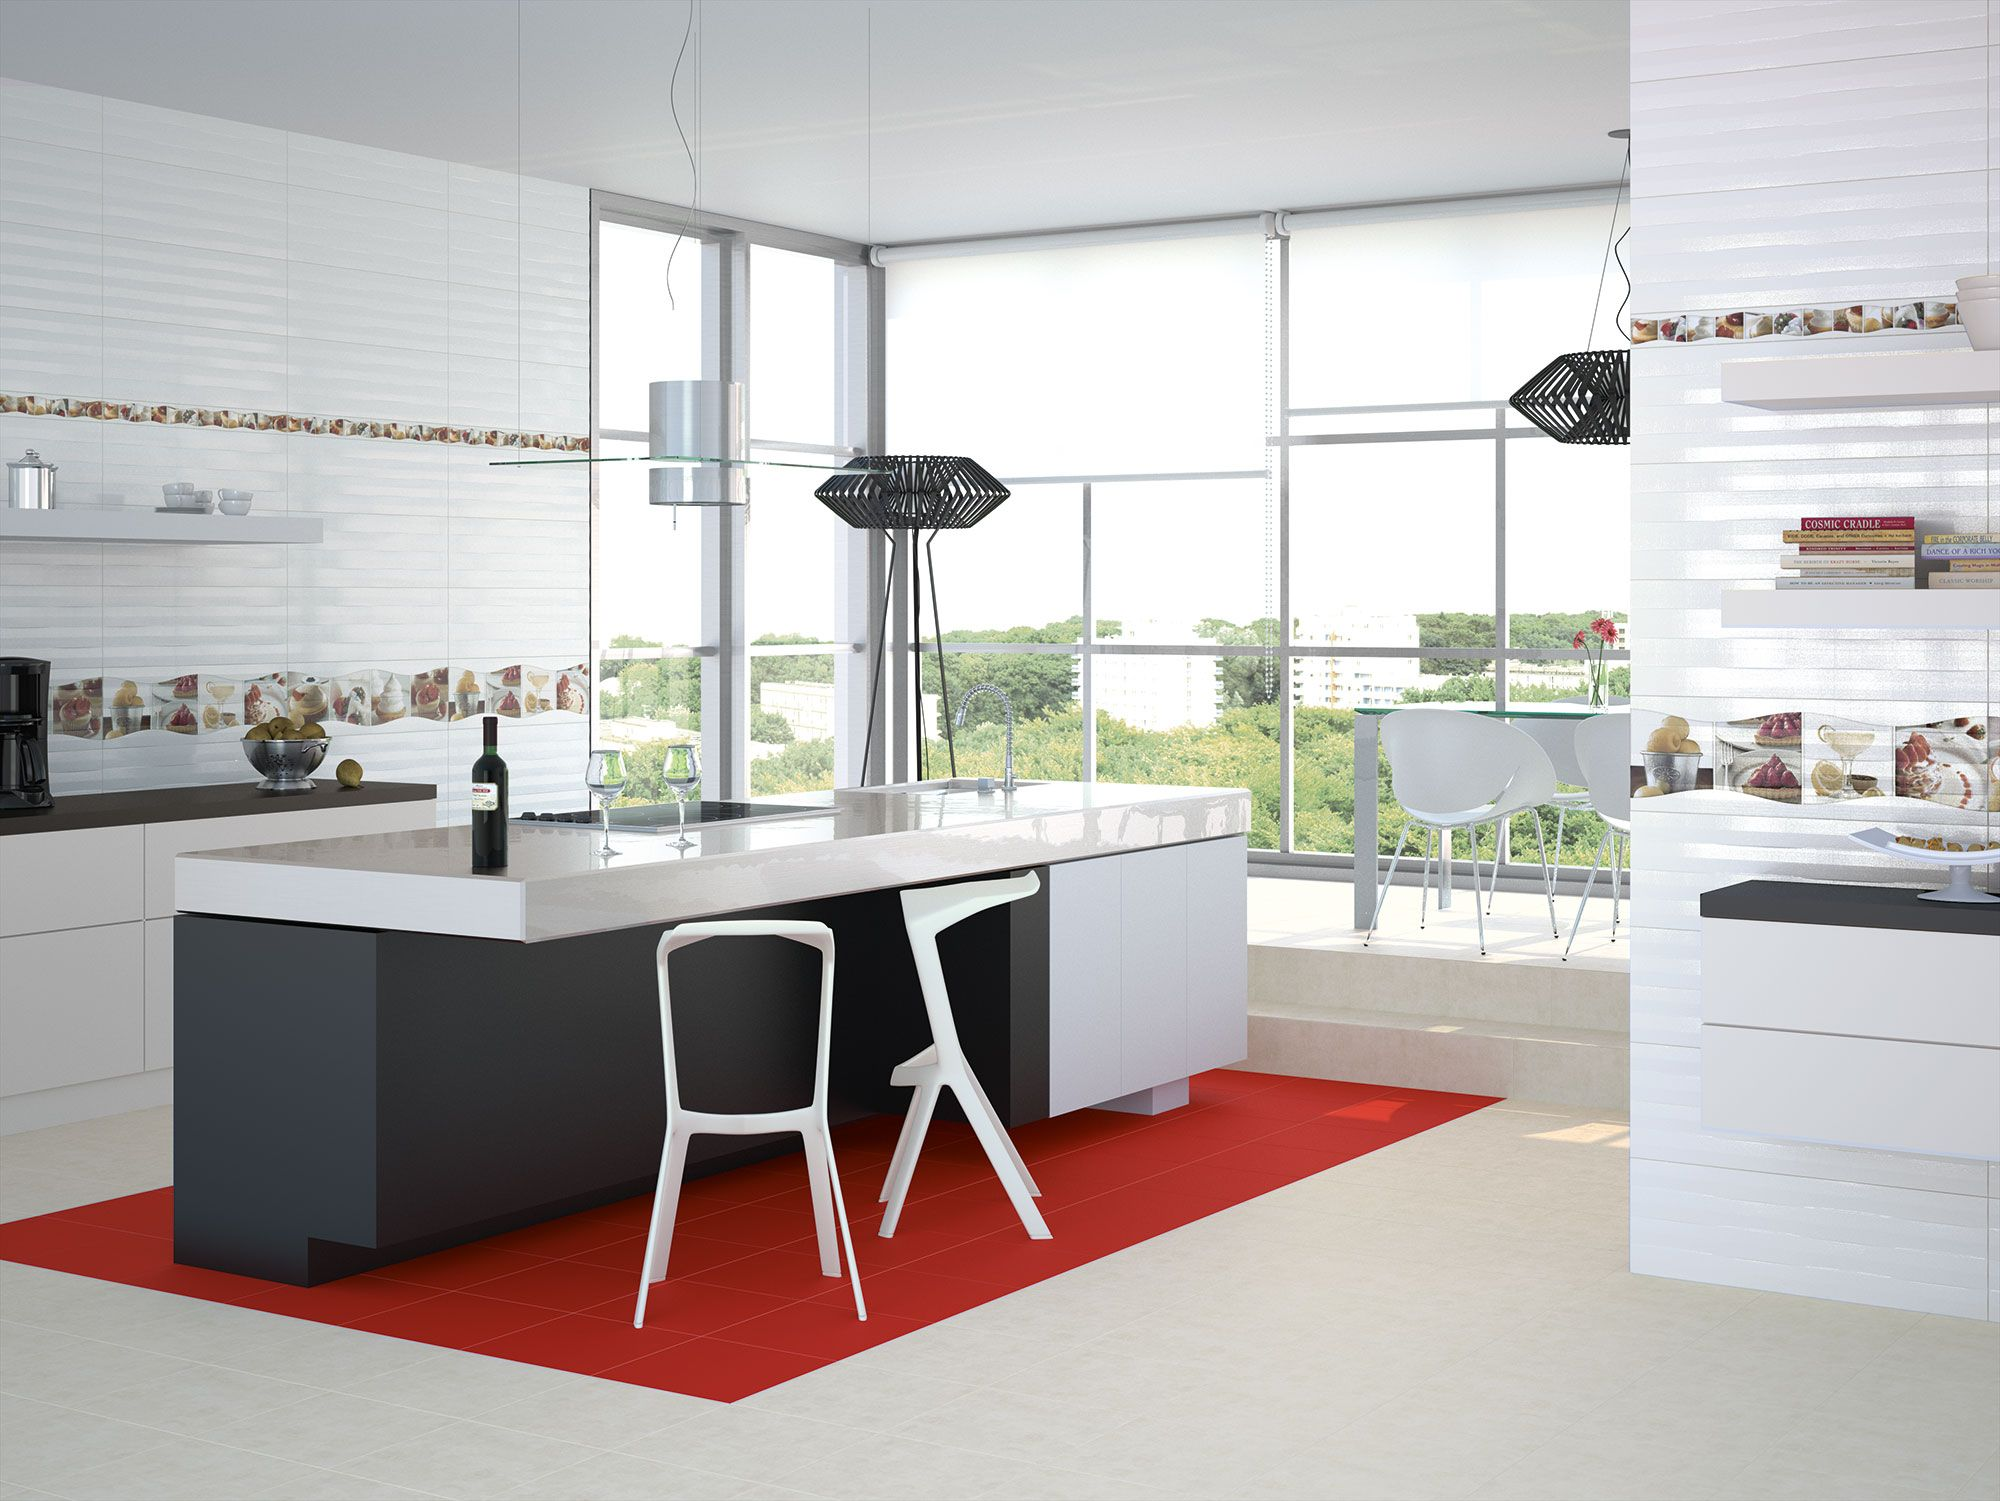 Azulejos para cocinas modernos elegant azulejos colores - Azulejos de cocina modernos ...